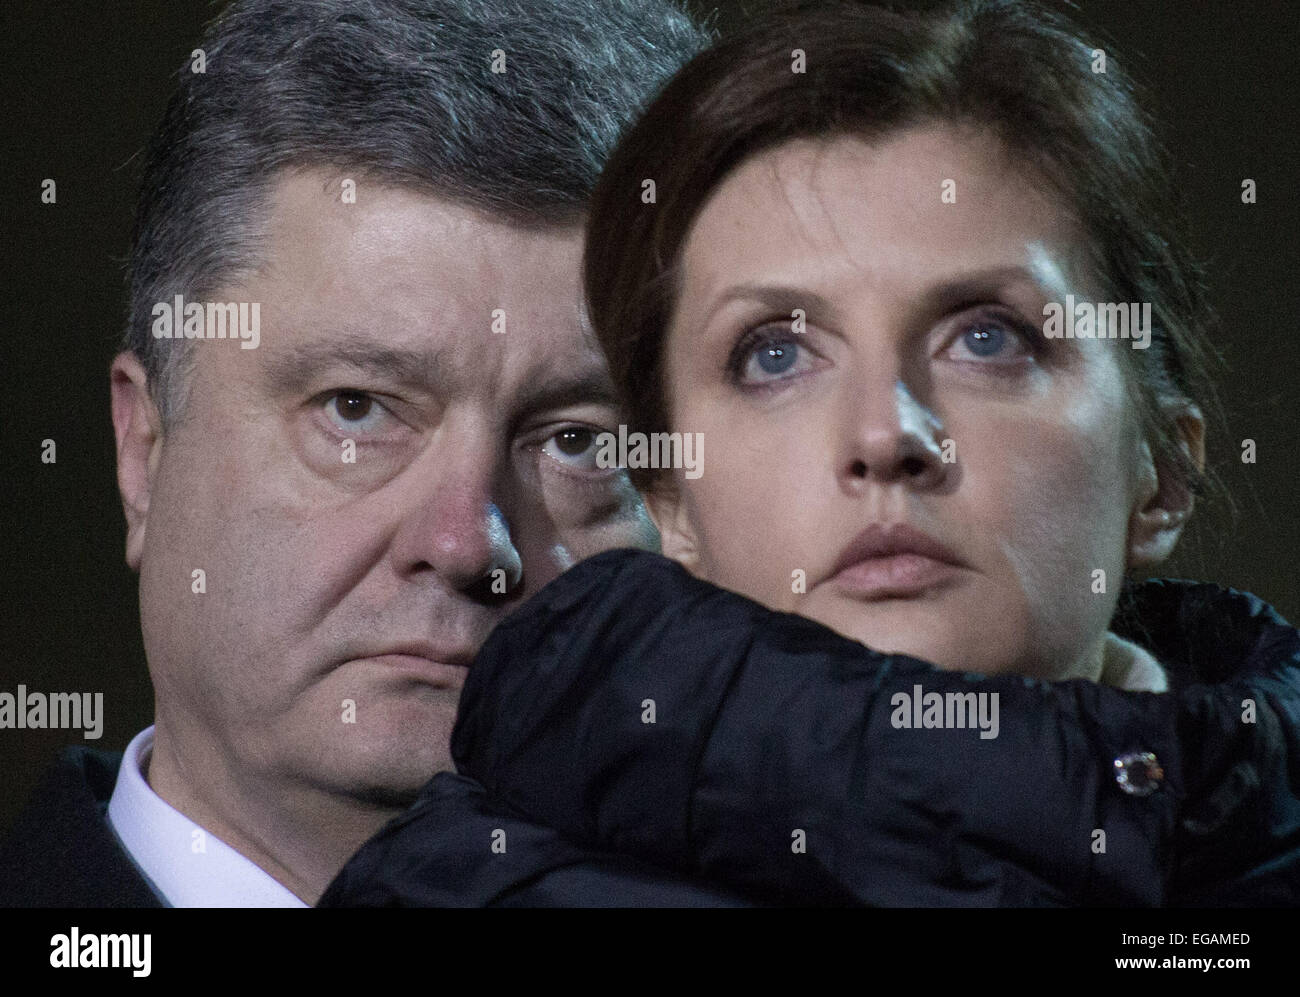 Kiev, Ukraine. 20th Feb, 2015. Ukraine's president Petro Poroshenko with his wife Marina attend an event in - Stock Image